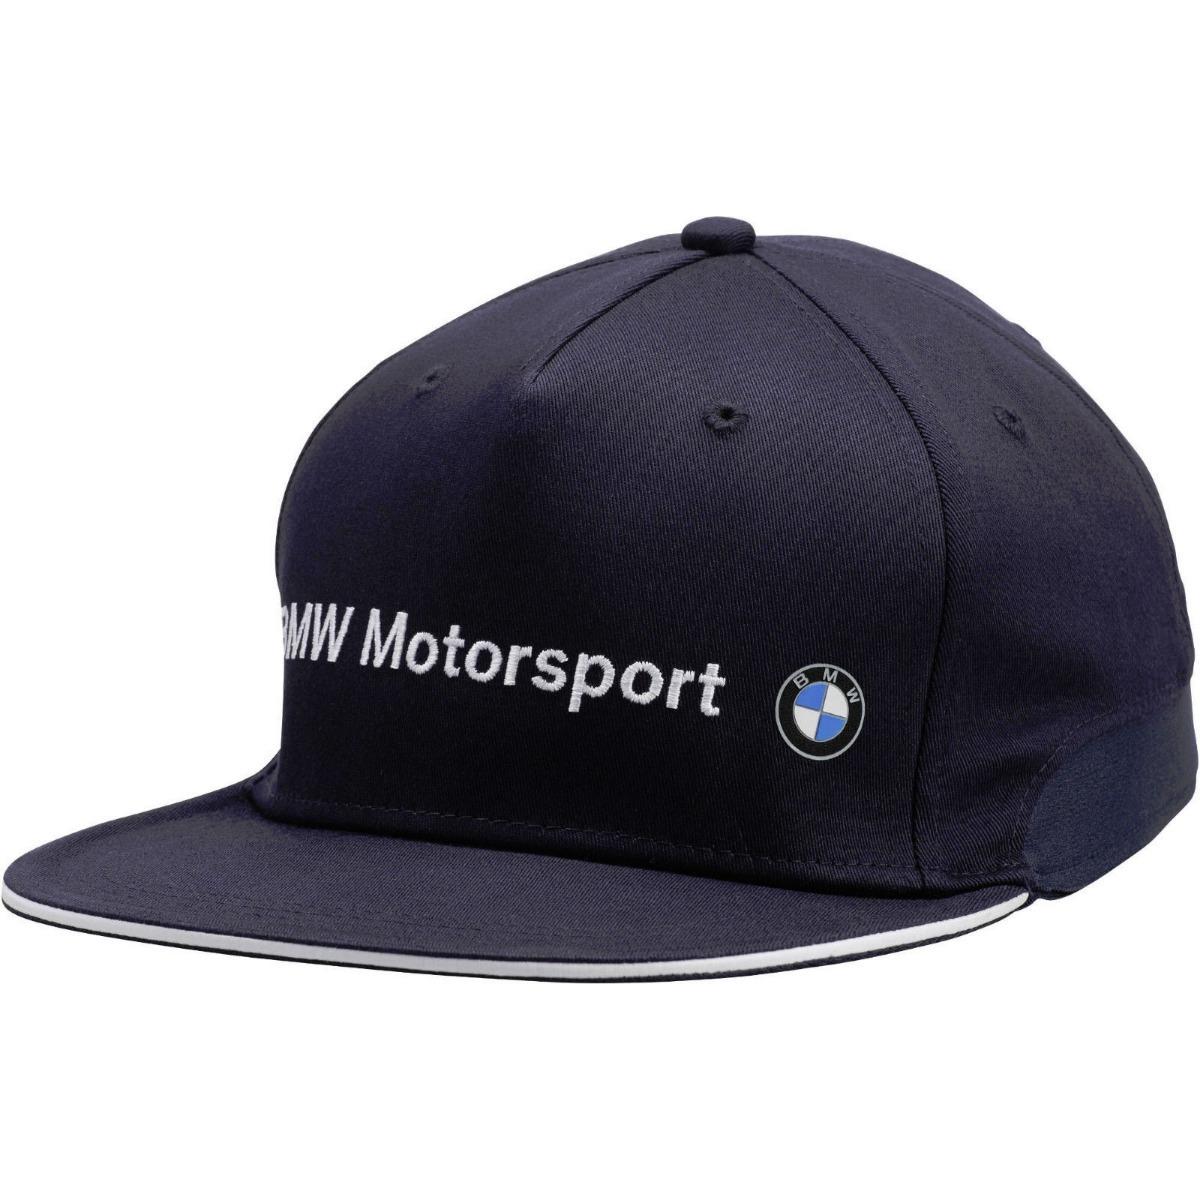 Gorra Visera Plana Bmw Motorsport - Por Pedido exkarg -   2.148 9fb016296e9